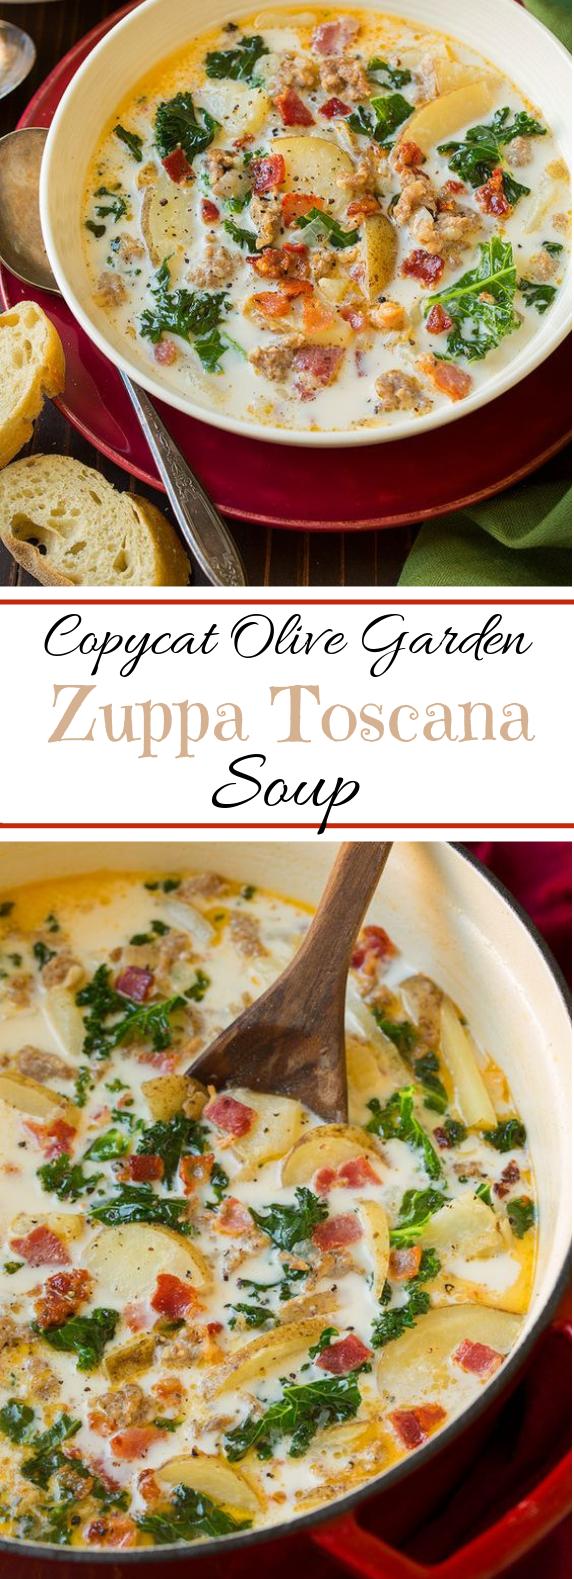 Zuppa Toscana Soup (Olive Garden Copycat) #winterrecipe #soup